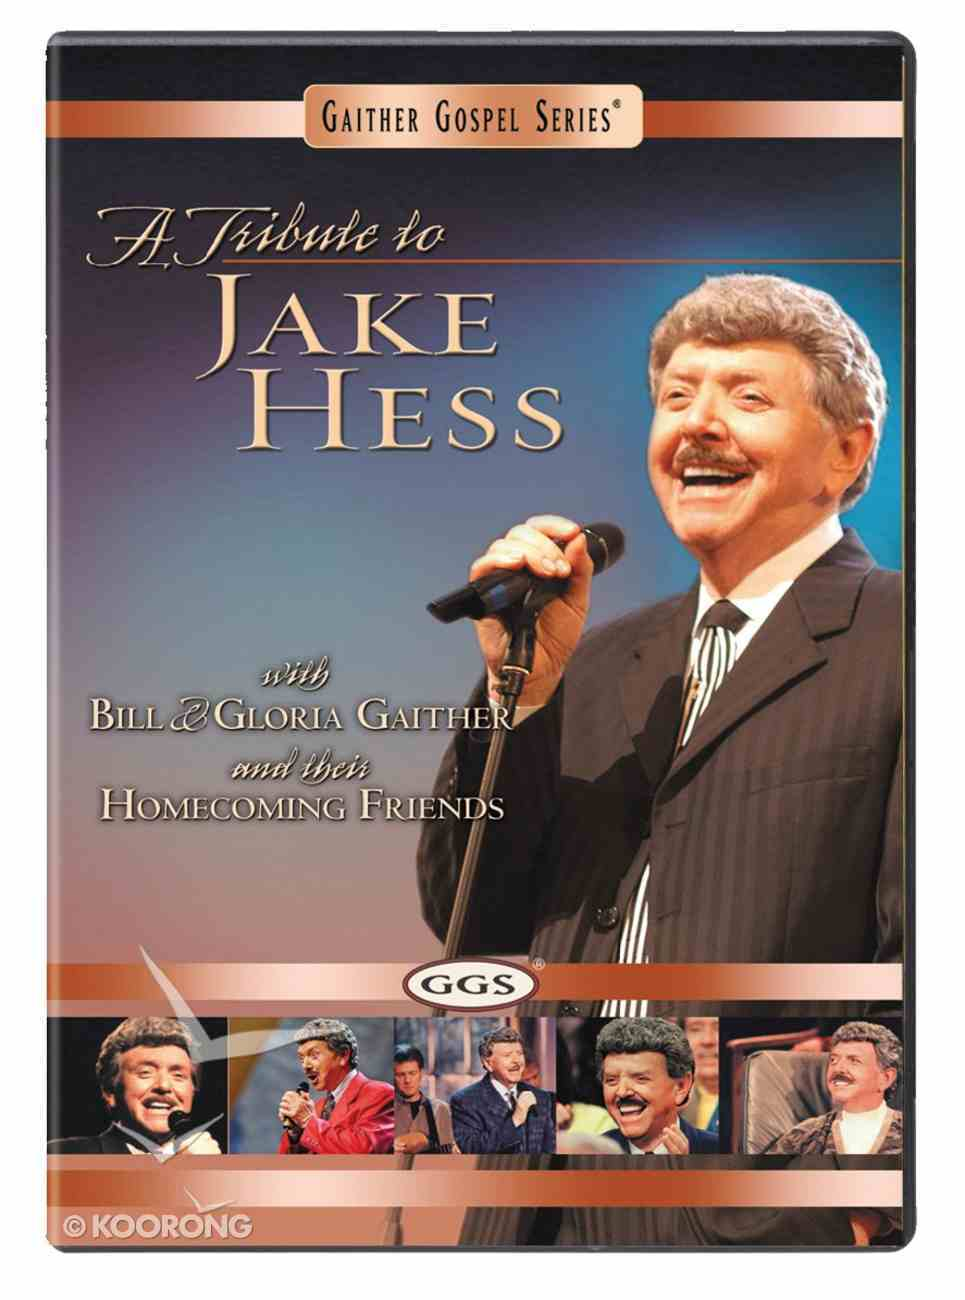 Tribute to Jake Hess (Gaither Gospel Series) DVD